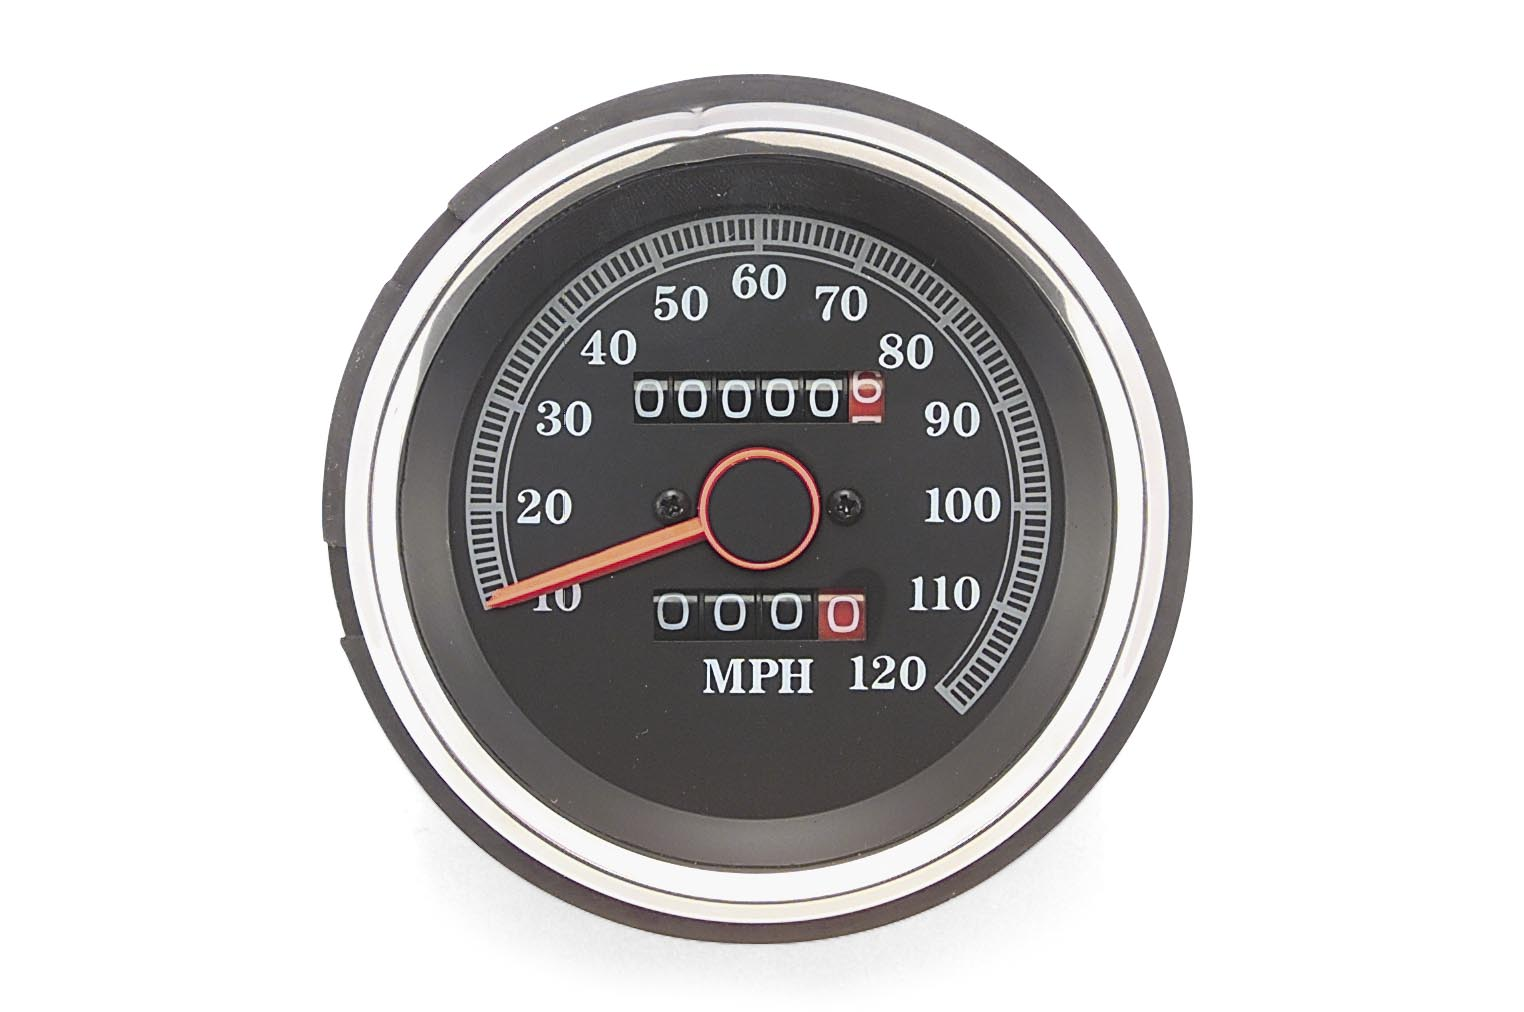 Details about Biker's Choice 74105 Replacement Instruments